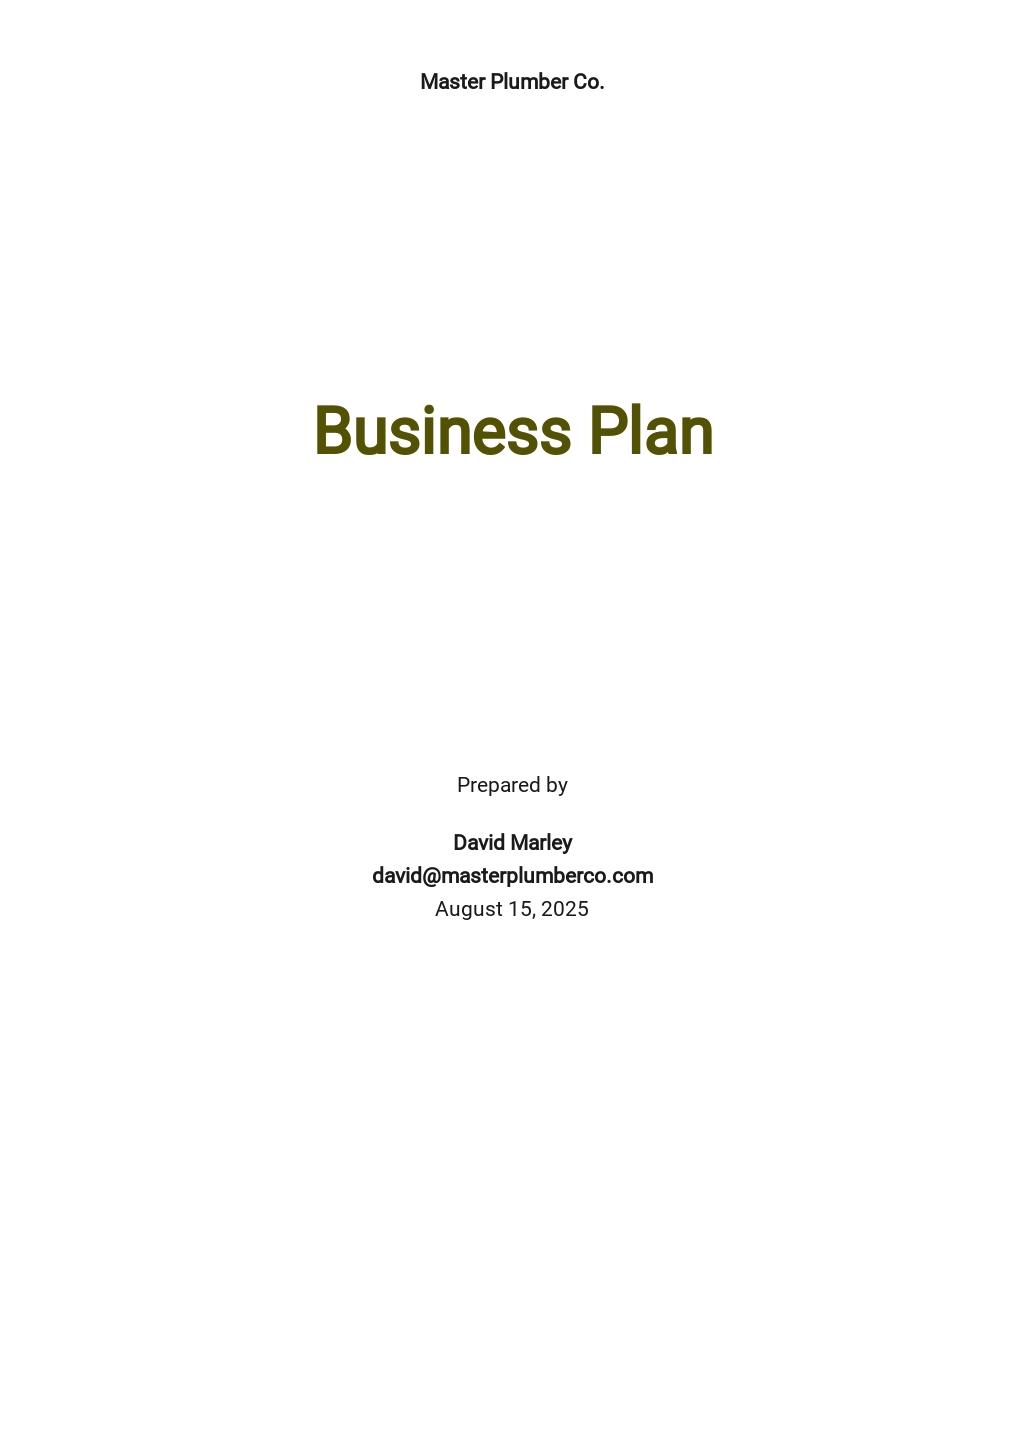 Plumbing Company Business Plan Template